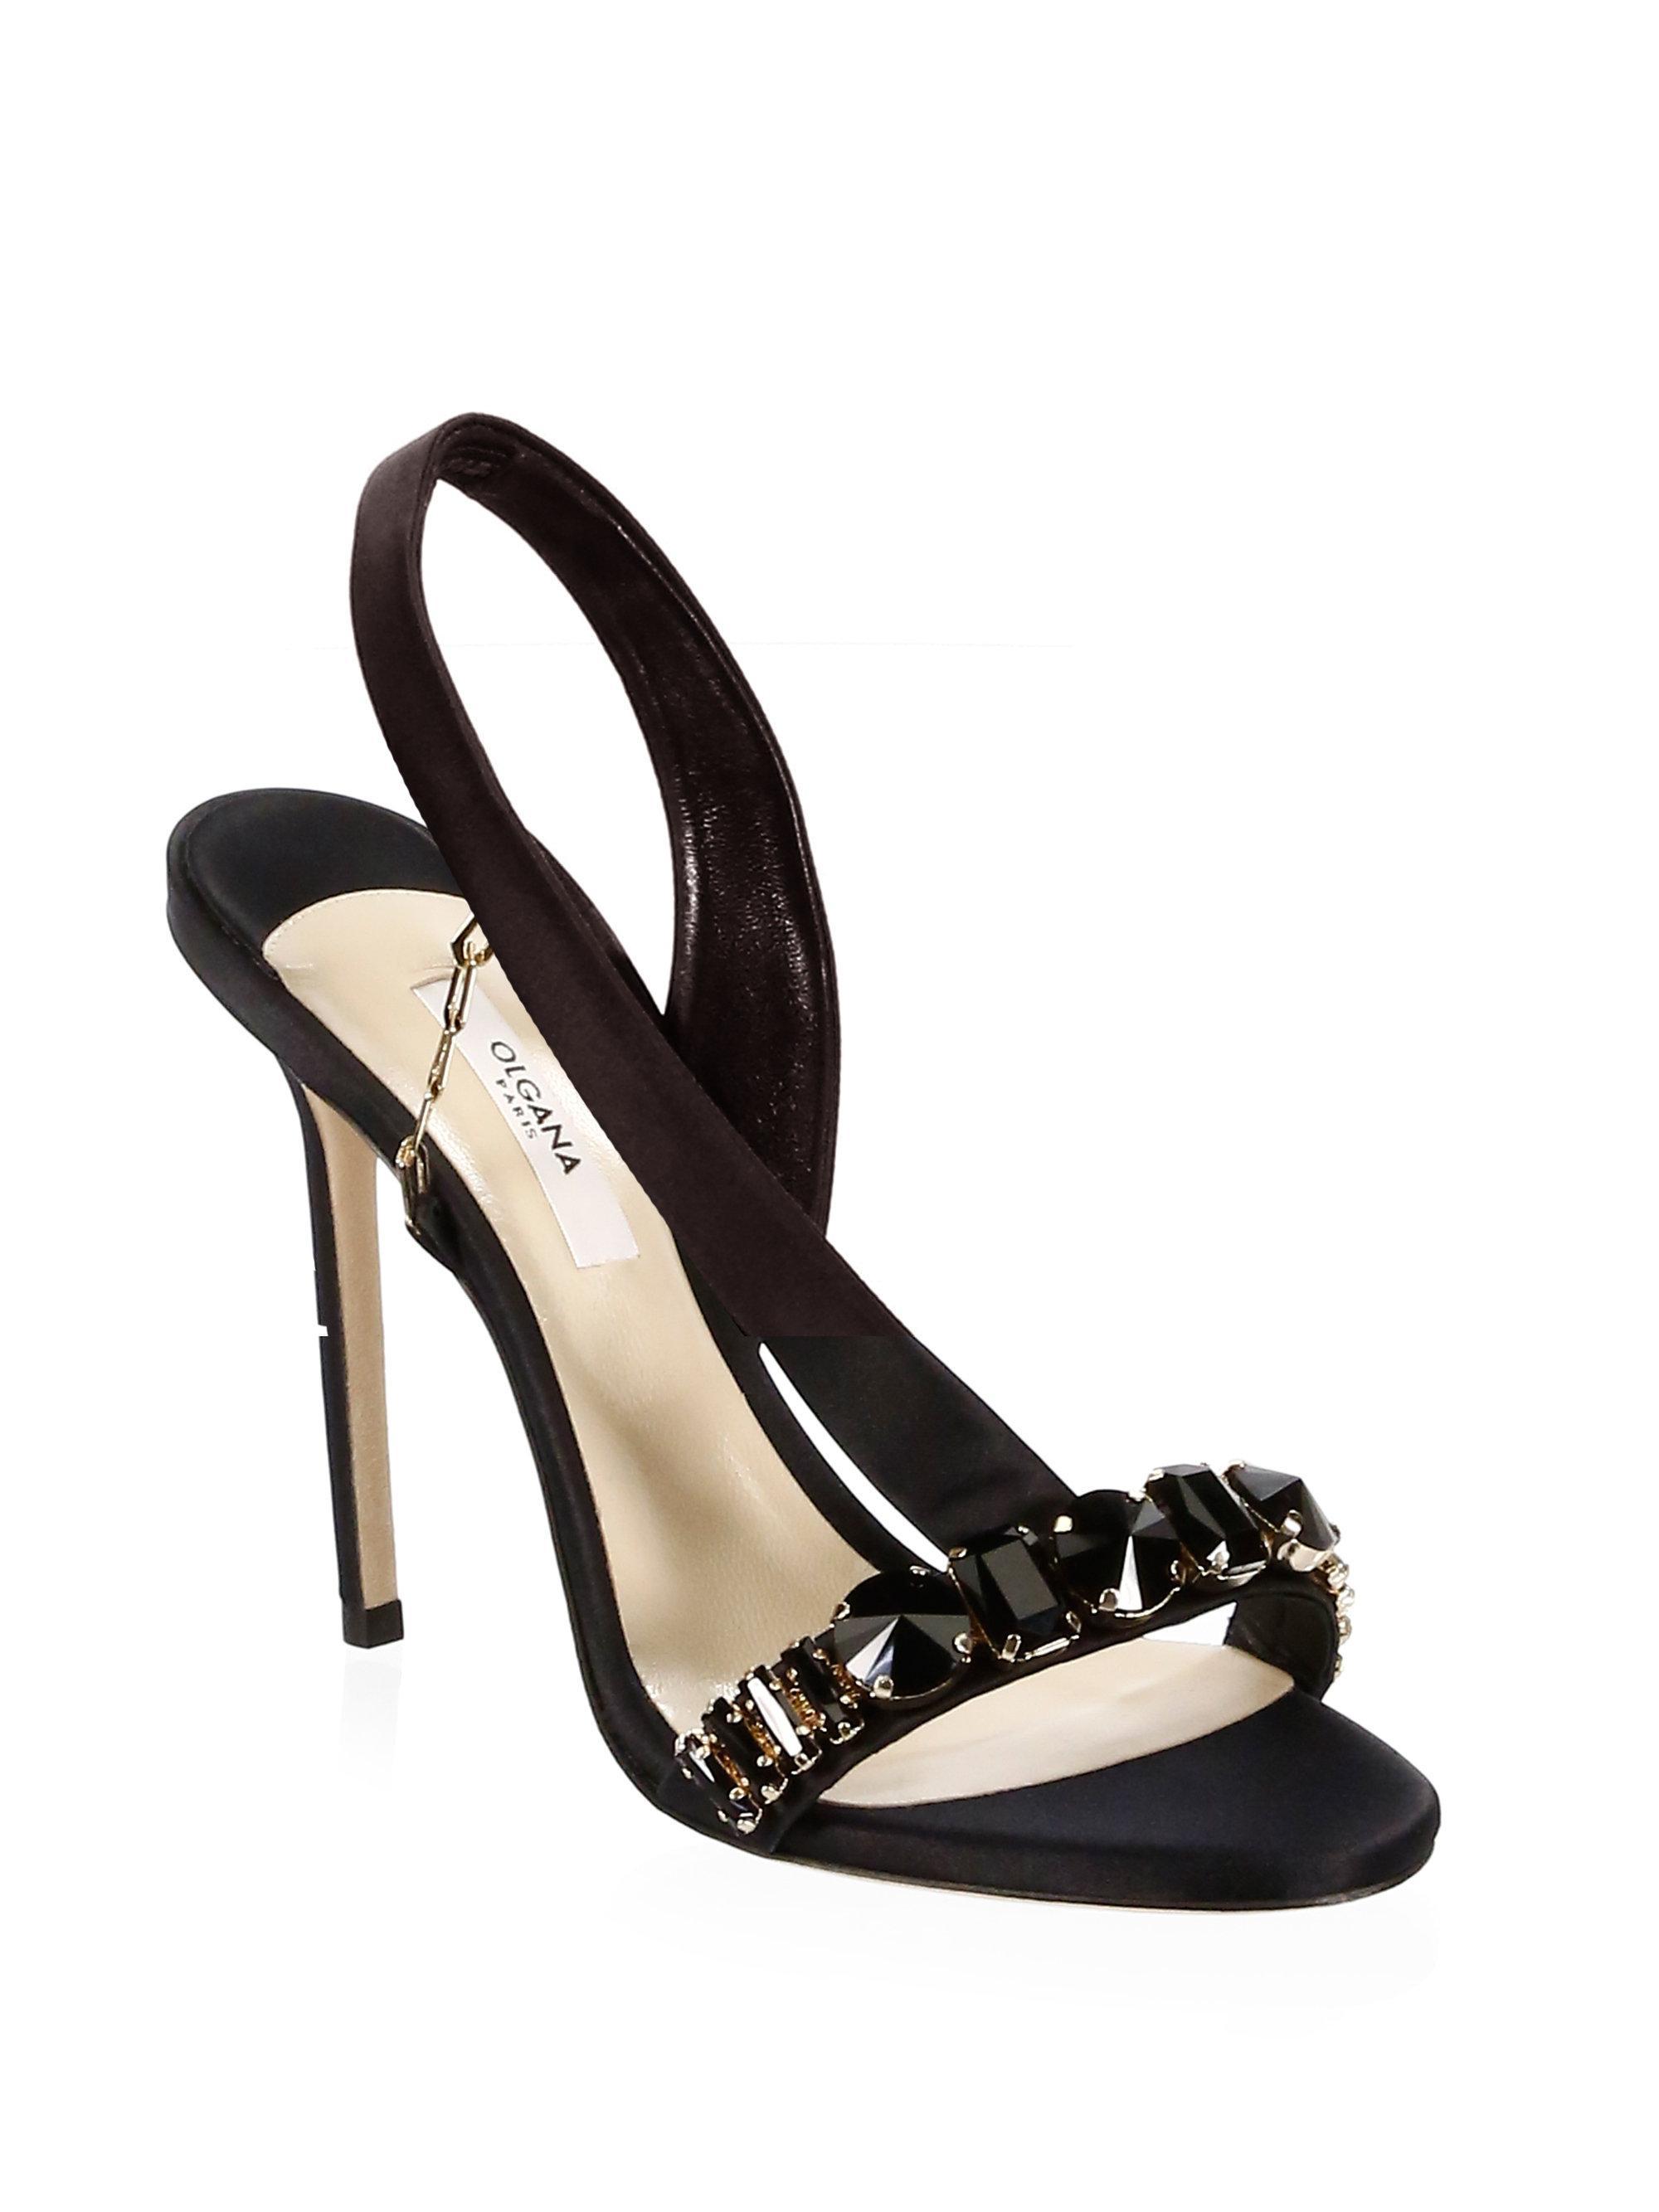 e6cf4acfb Lyst - Olgana Paris Jeweled Satin Pumps in Black